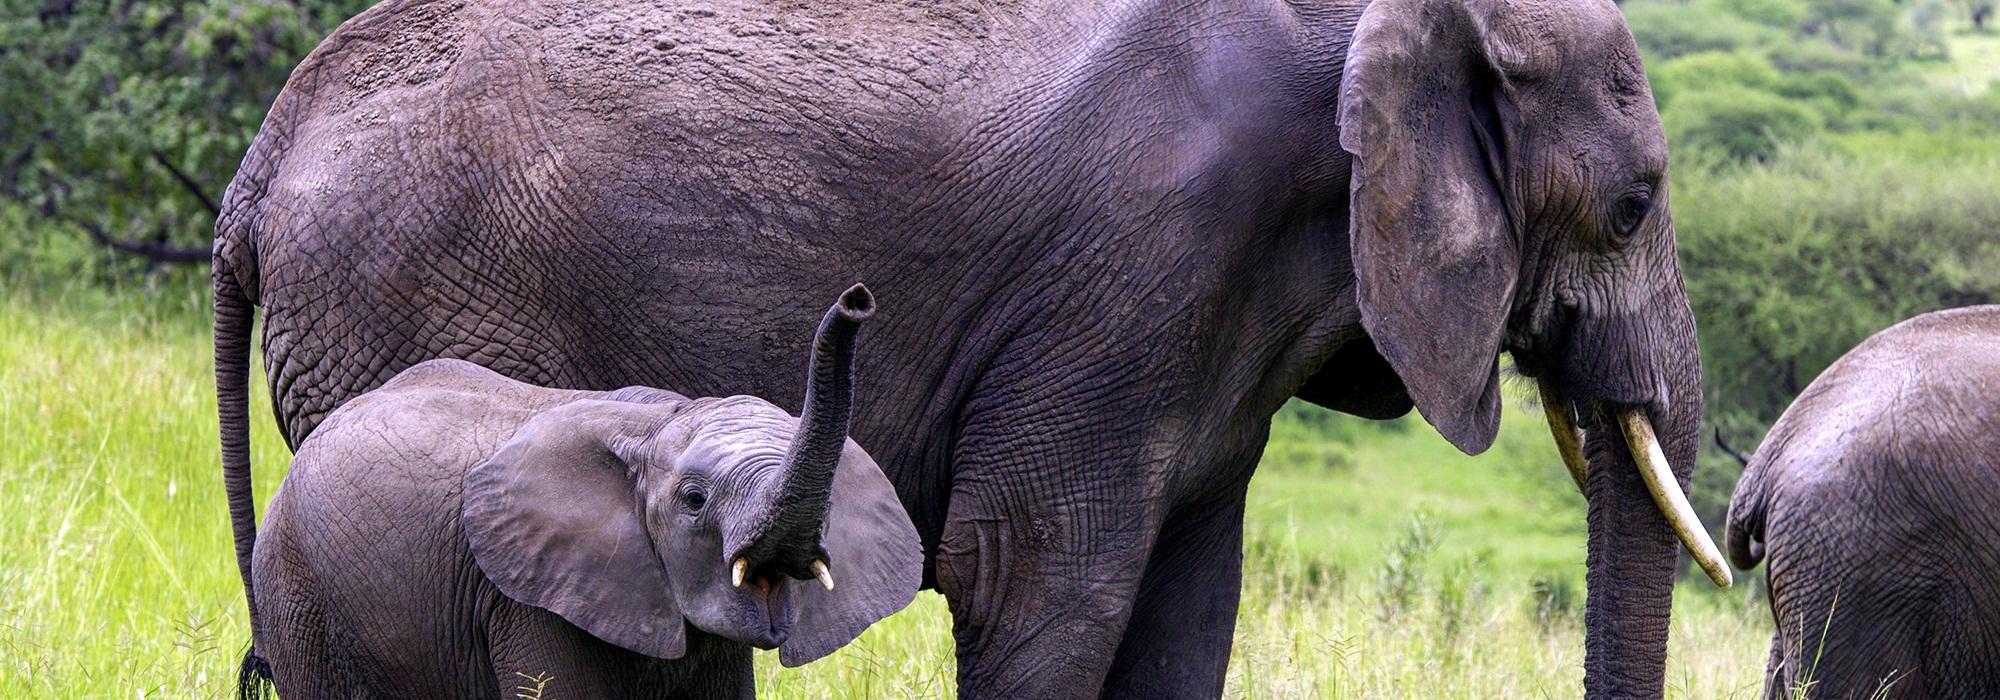 wildlife safaris attractions